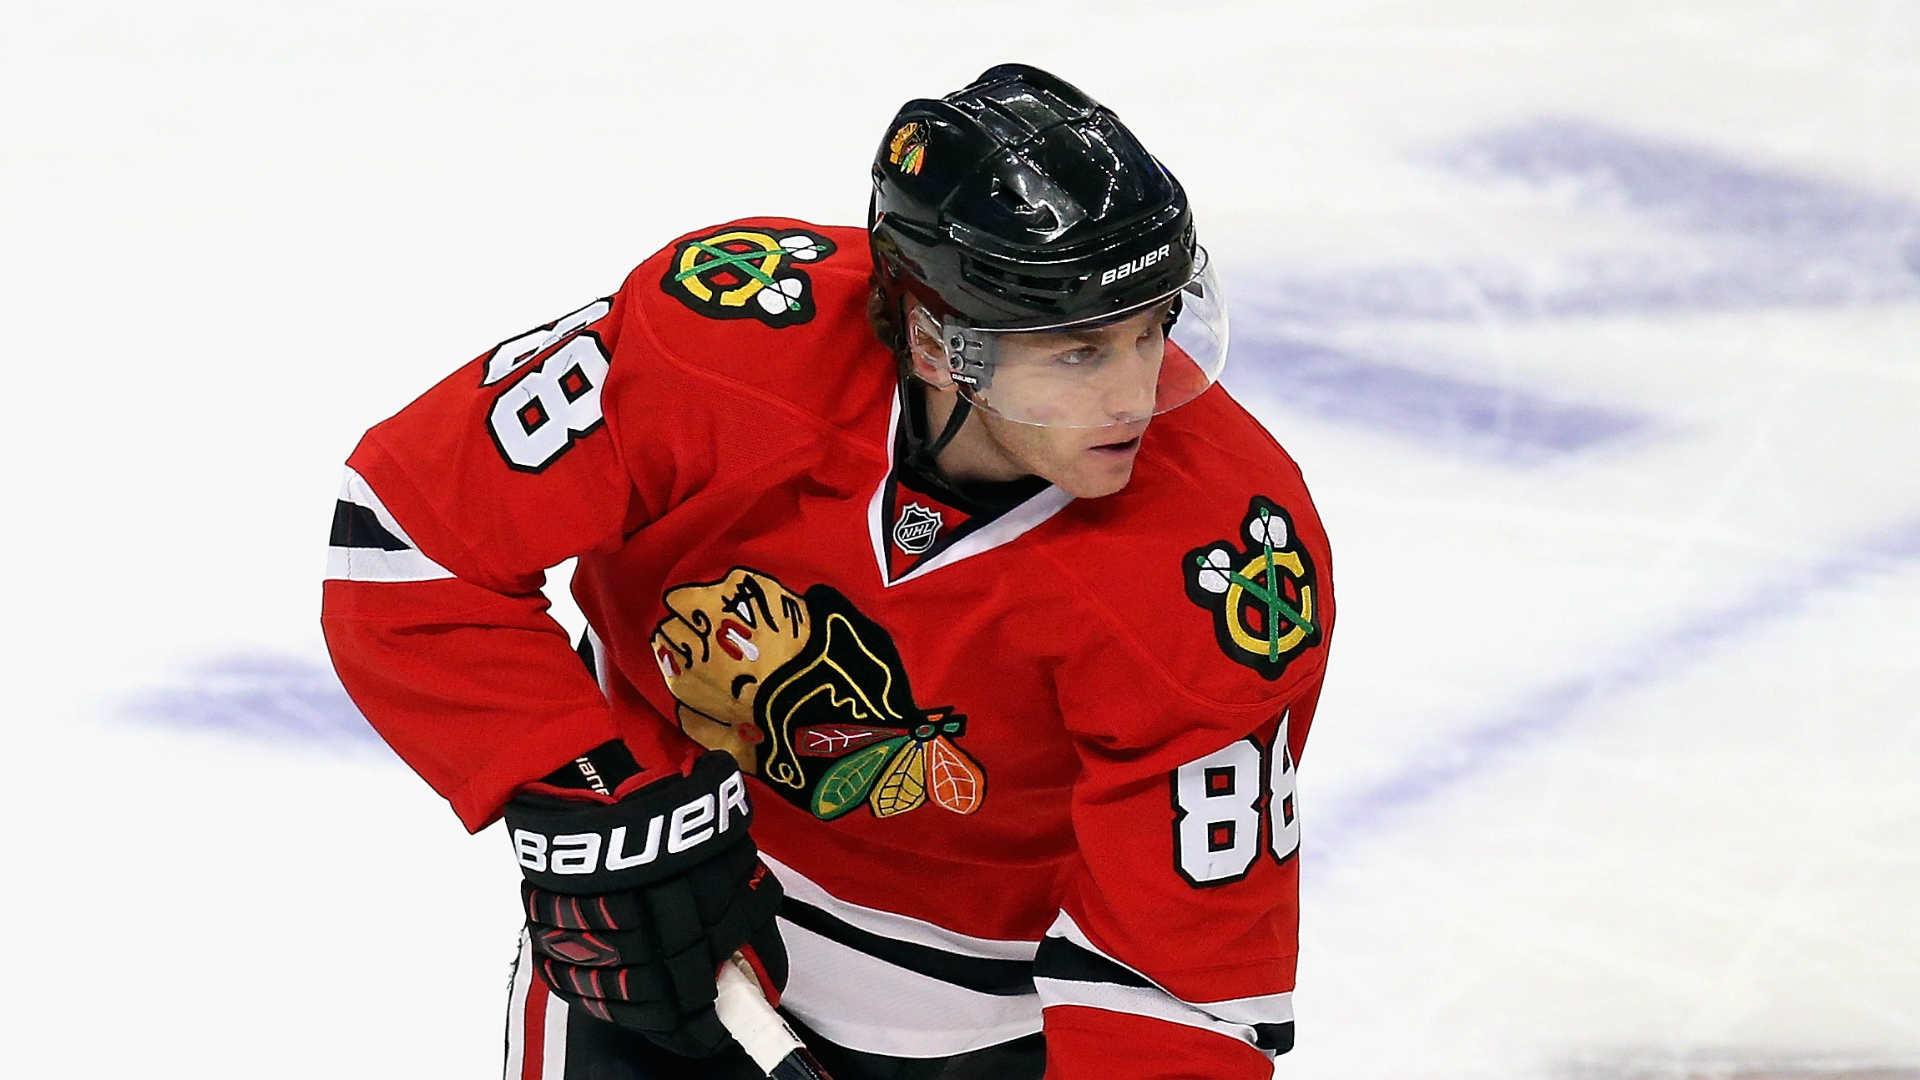 Patrick Kane no longer on NHL 16 cover amid police investigation | NHL |  Sporting News